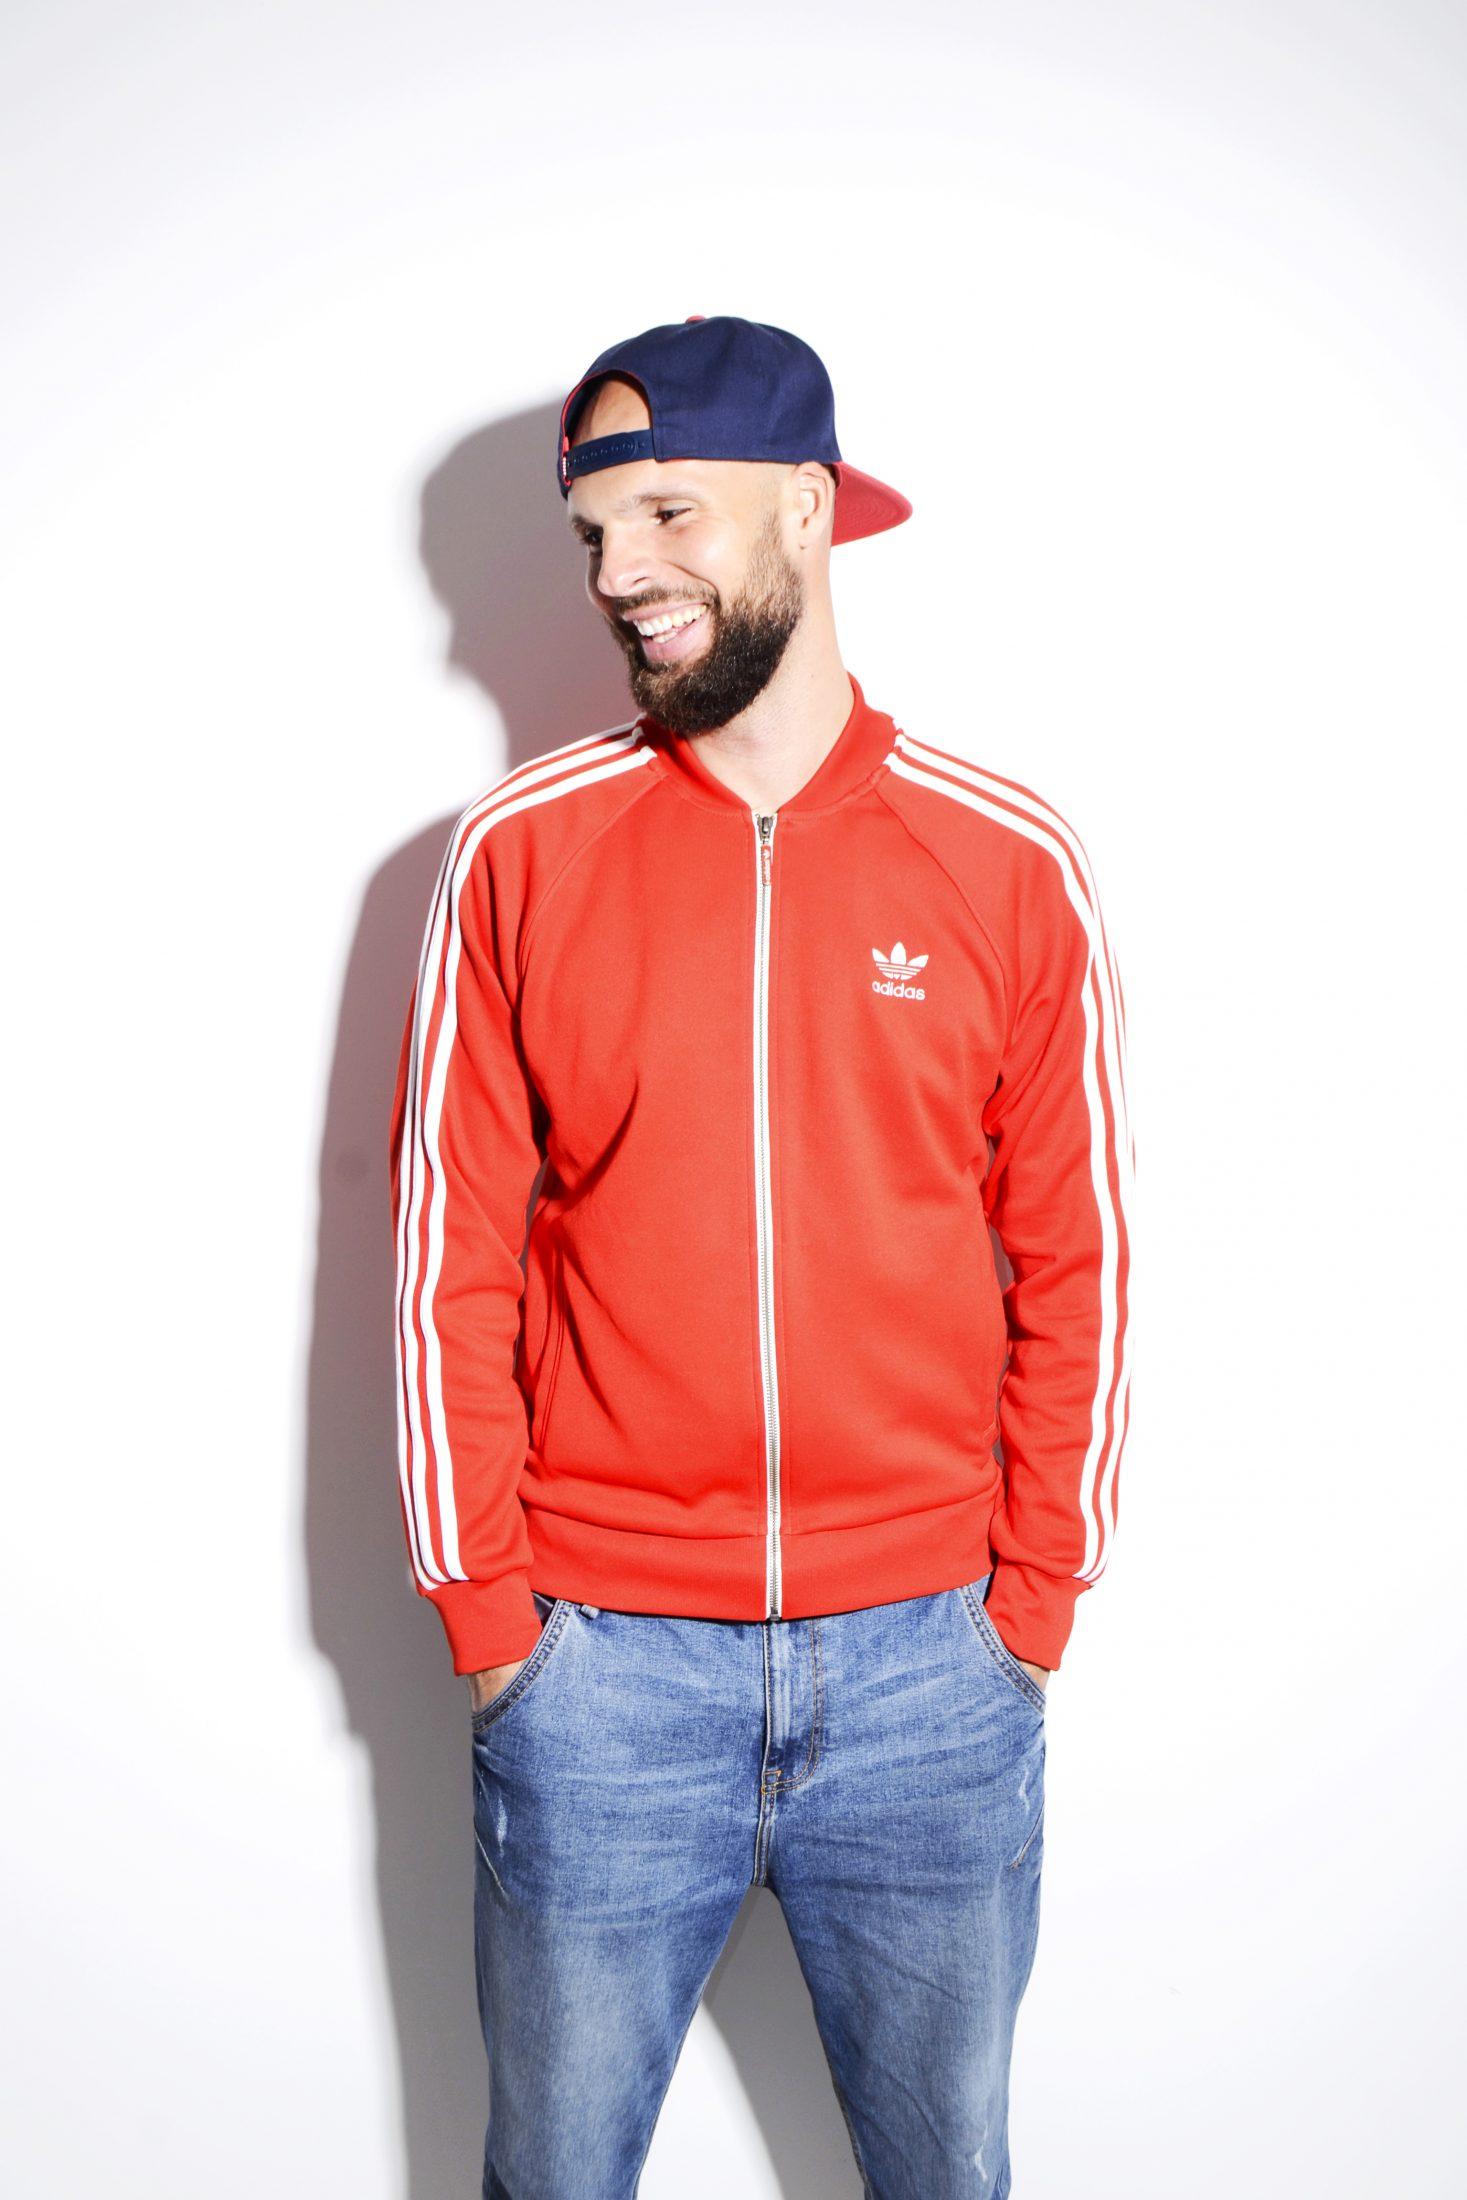 b89c52f2 Adidas Originals Superstar Track Jacket | HOT MILK vintage clothes ...